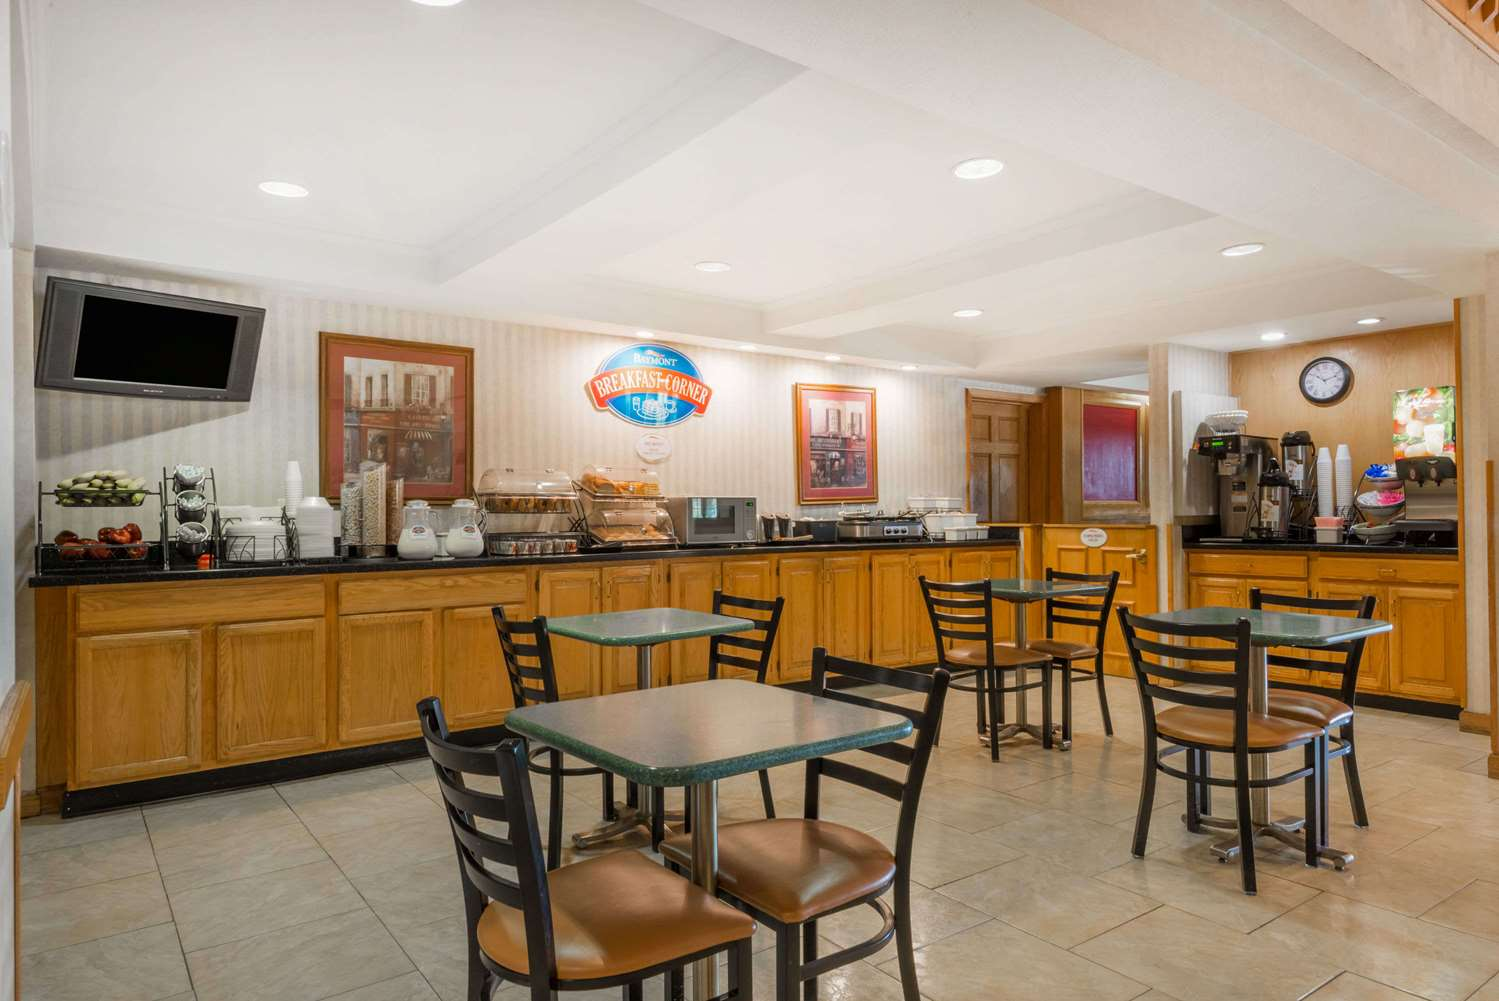 proam - Baymont Inn & Suites Indianapolis Airport Plainfield